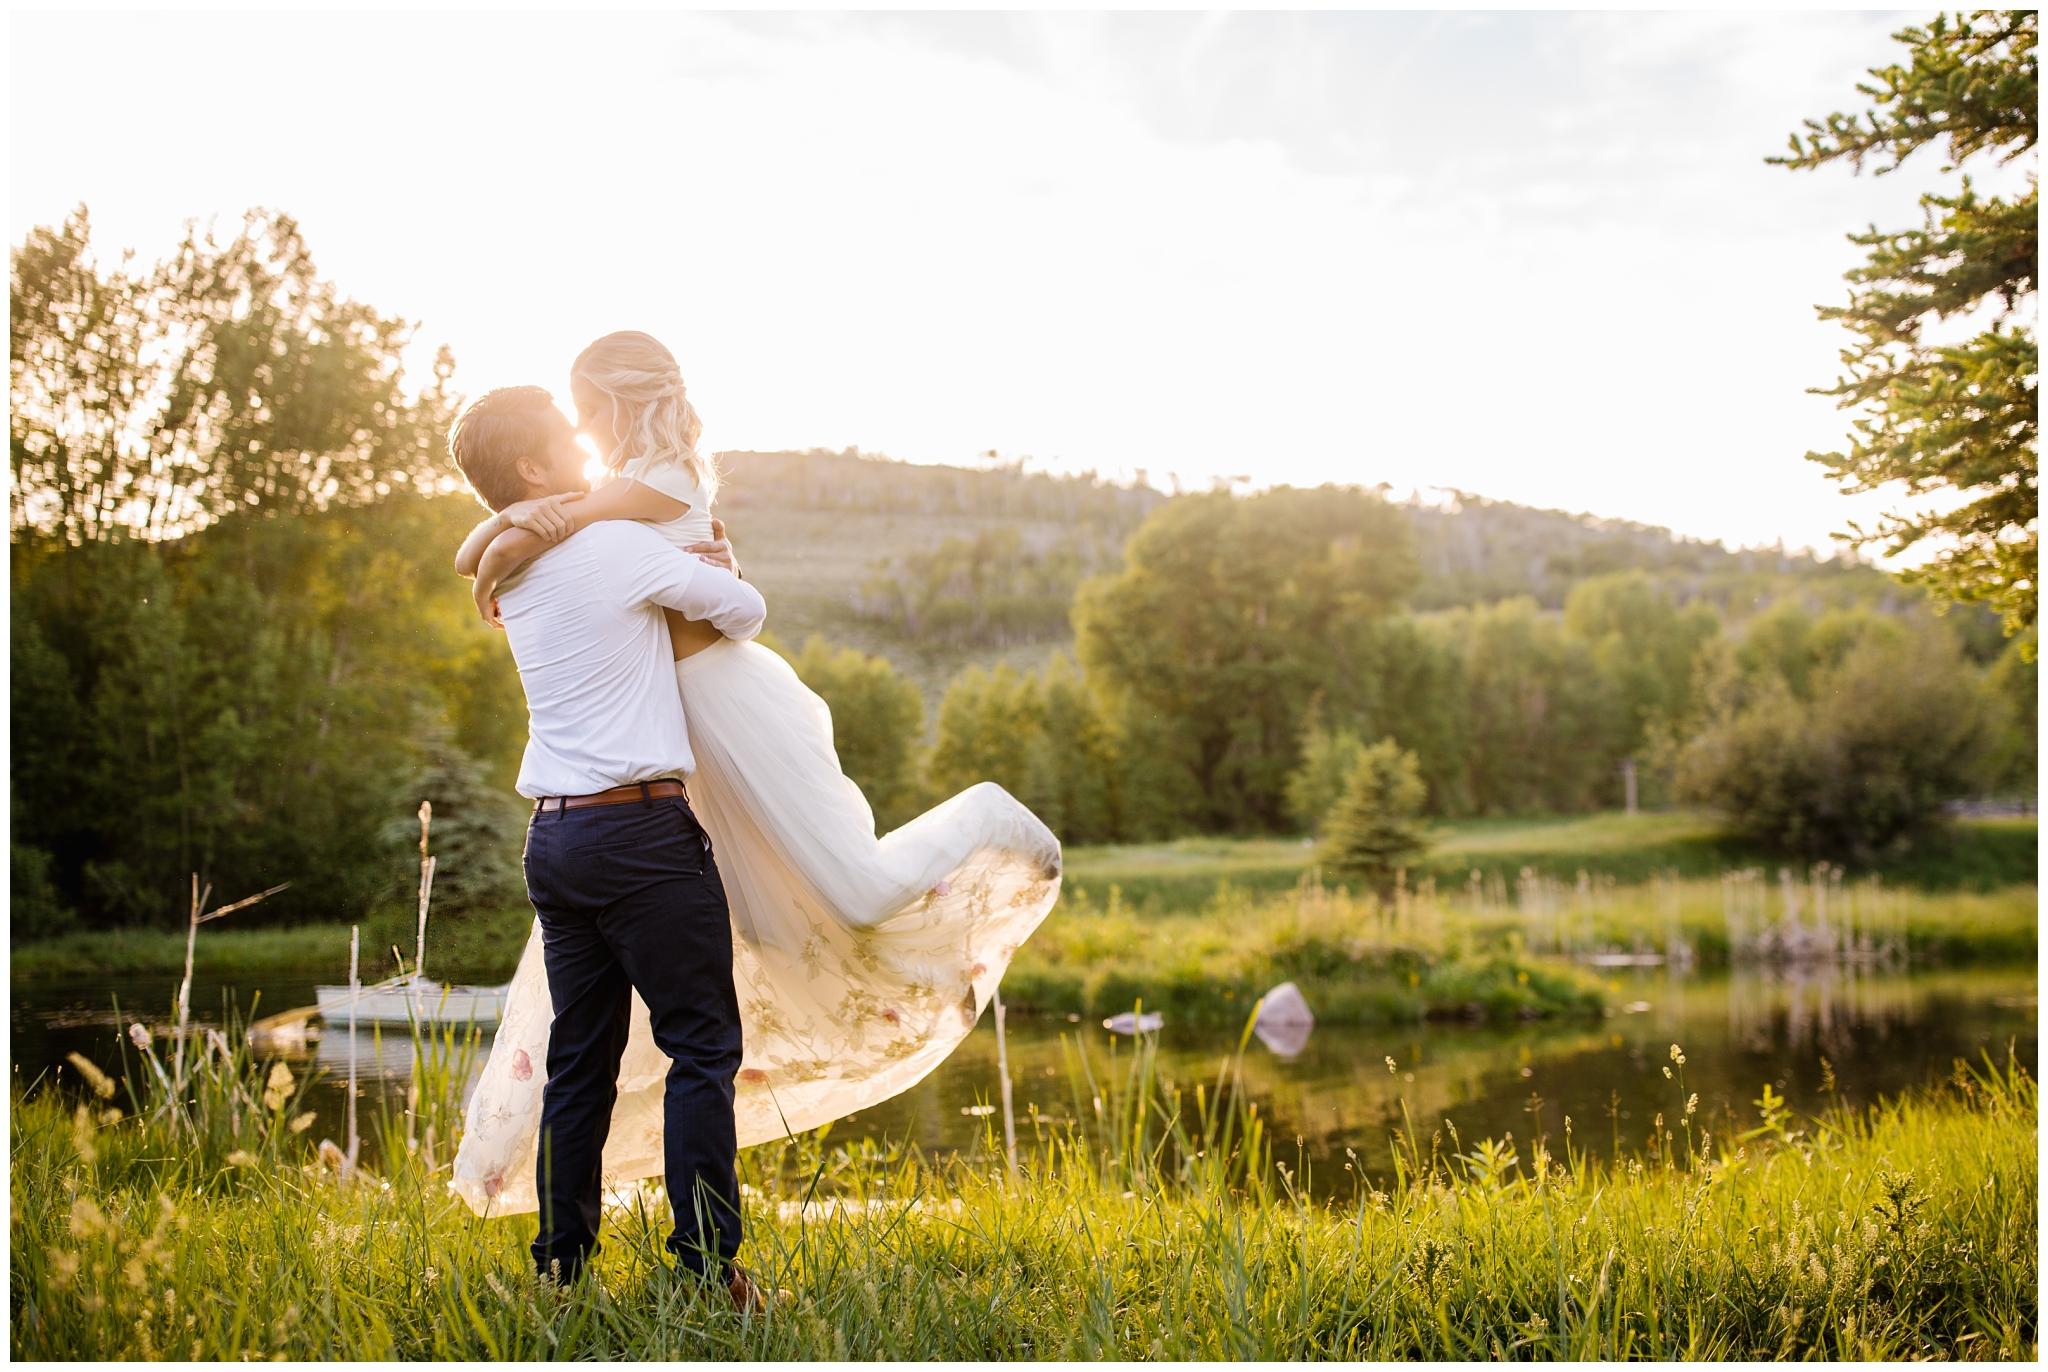 Lizzie-B-Imagery-Utah-Wedding-Photographer-Park-City-Photographer_0059.jpg